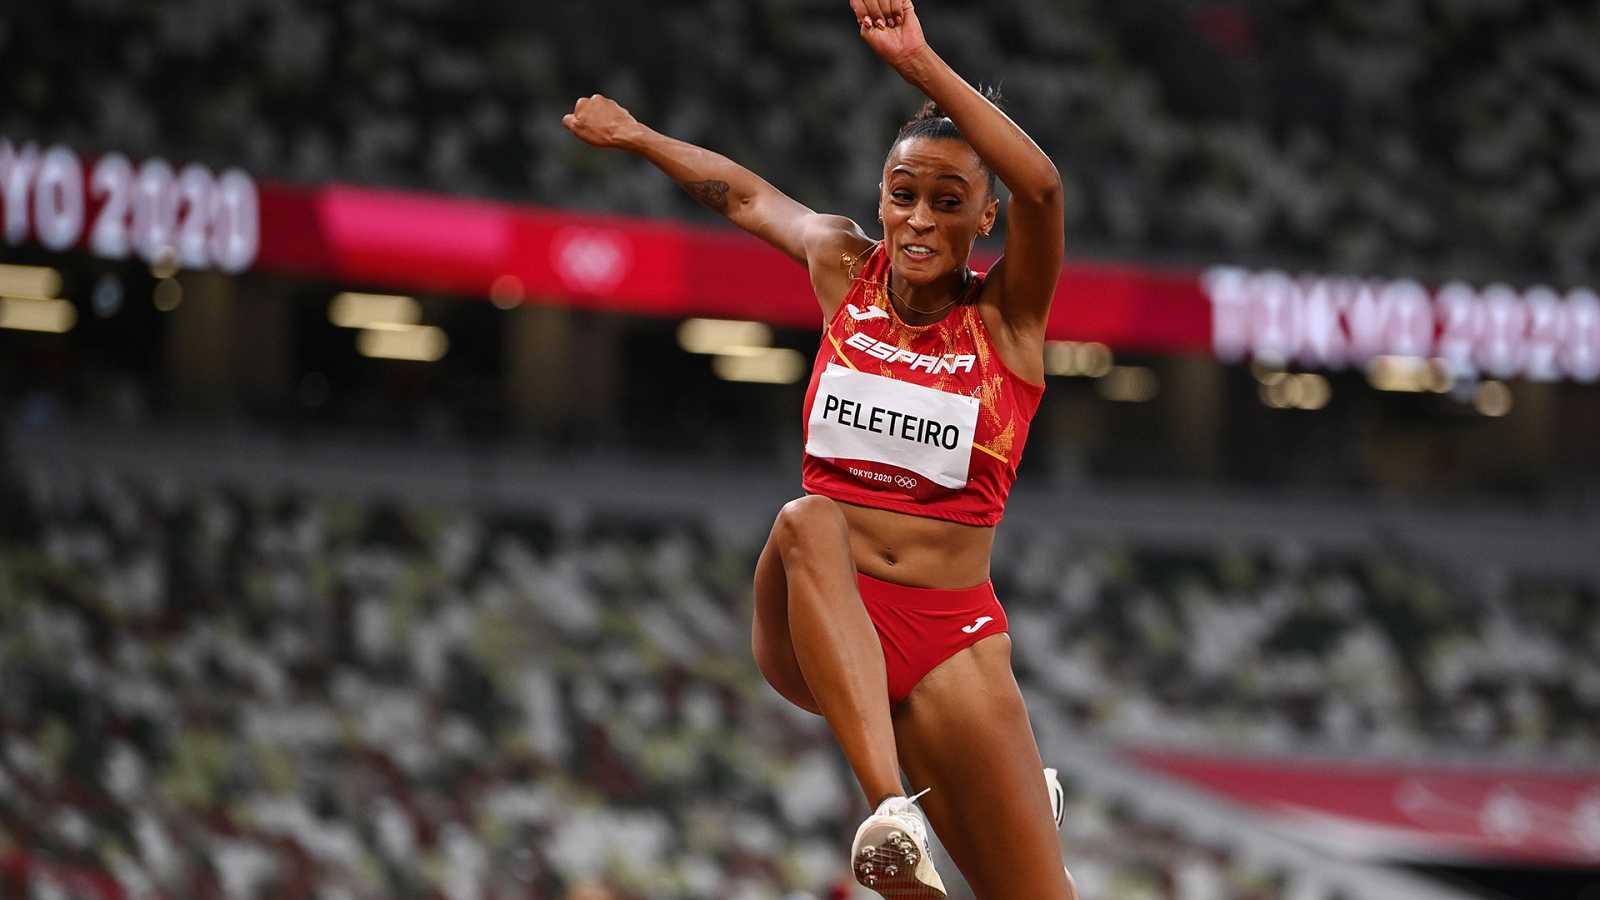 Atletismo: Sesión Vespertina. Jornada 1